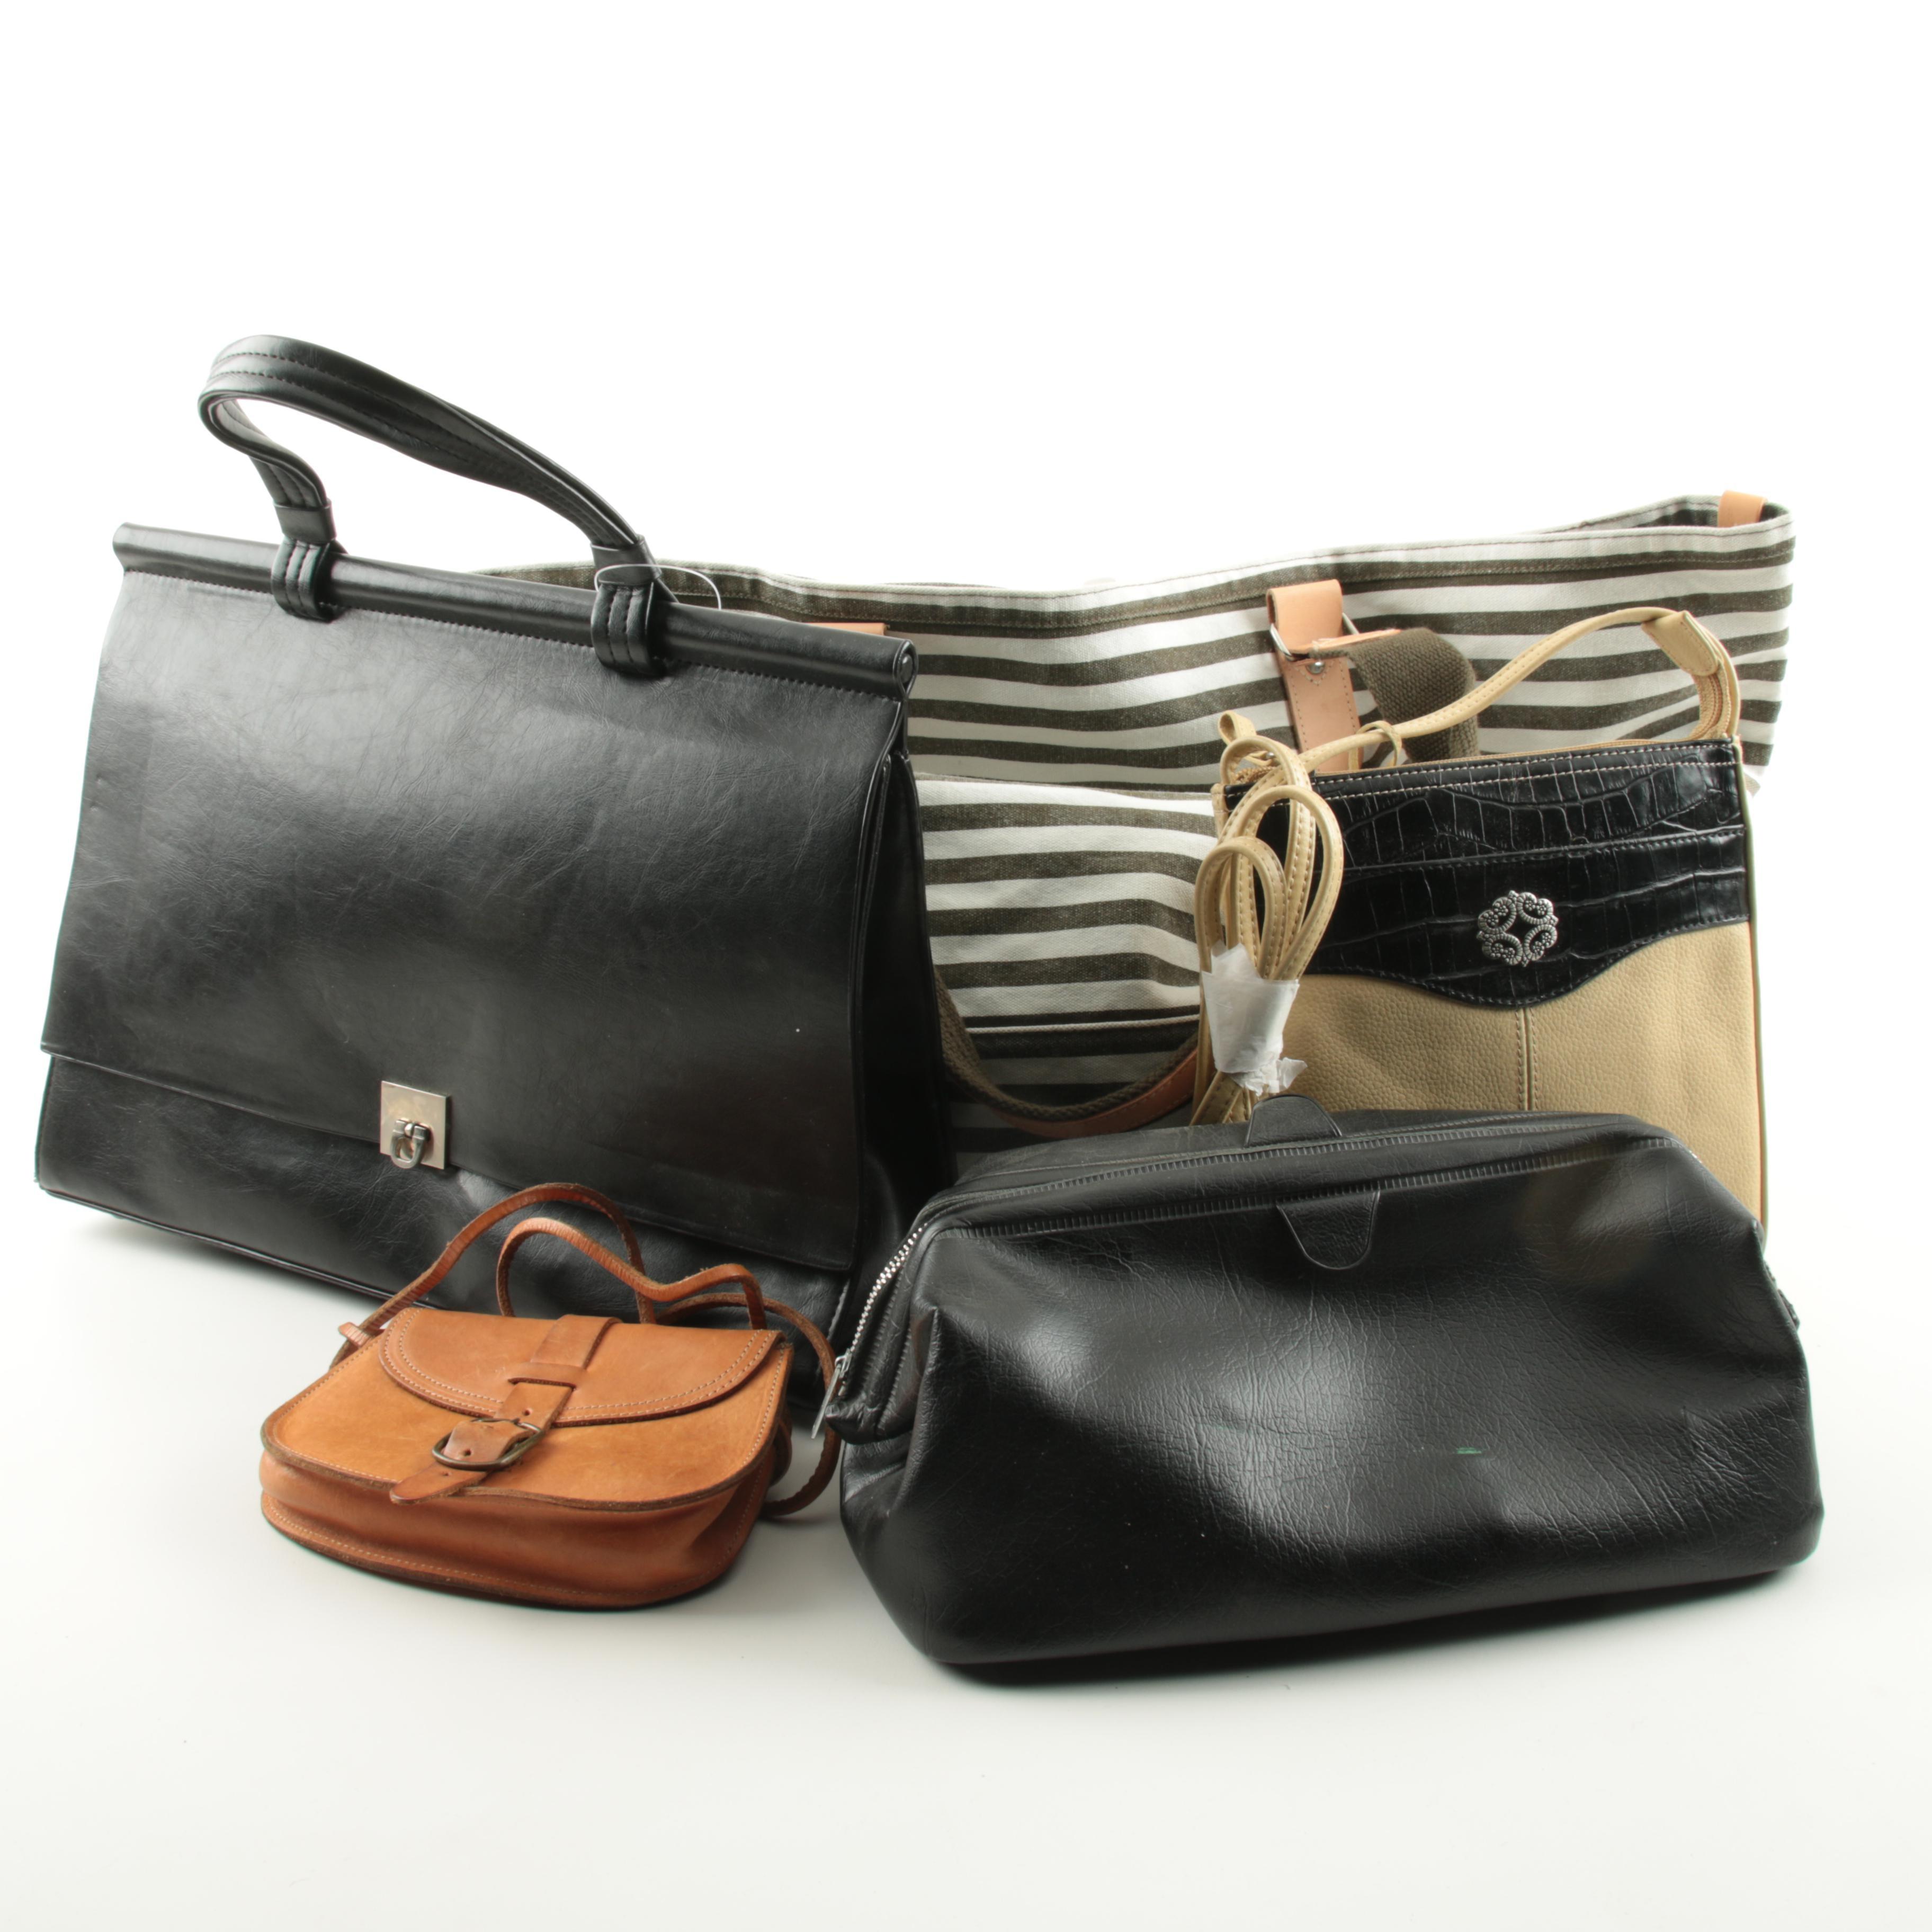 Leather Handbags Including a Gap Canvas Shopper Tote